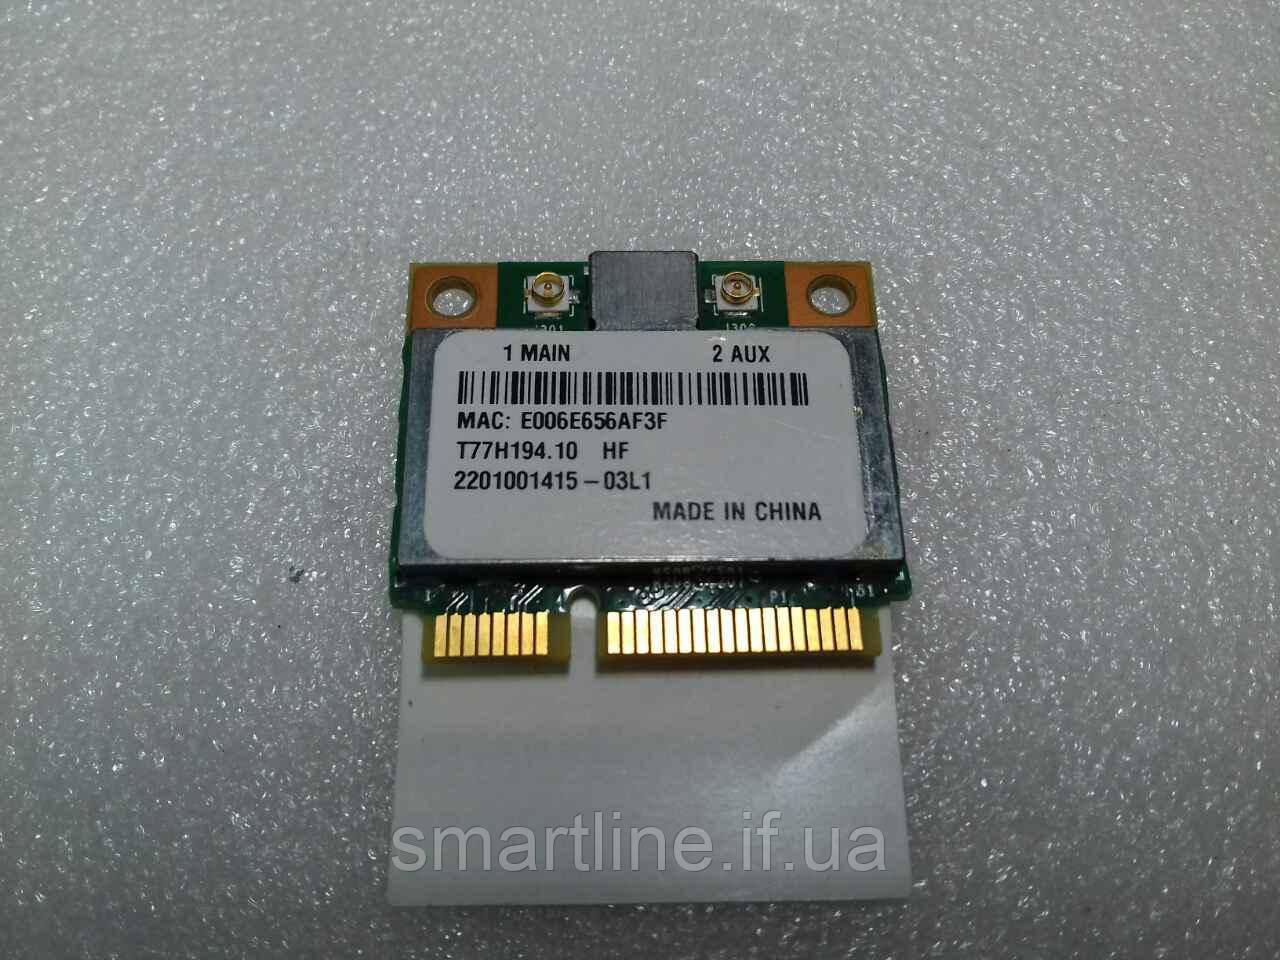 WI-FI адаптер ноутбука ACER Aspire One D270, 4324A-BRCM1050